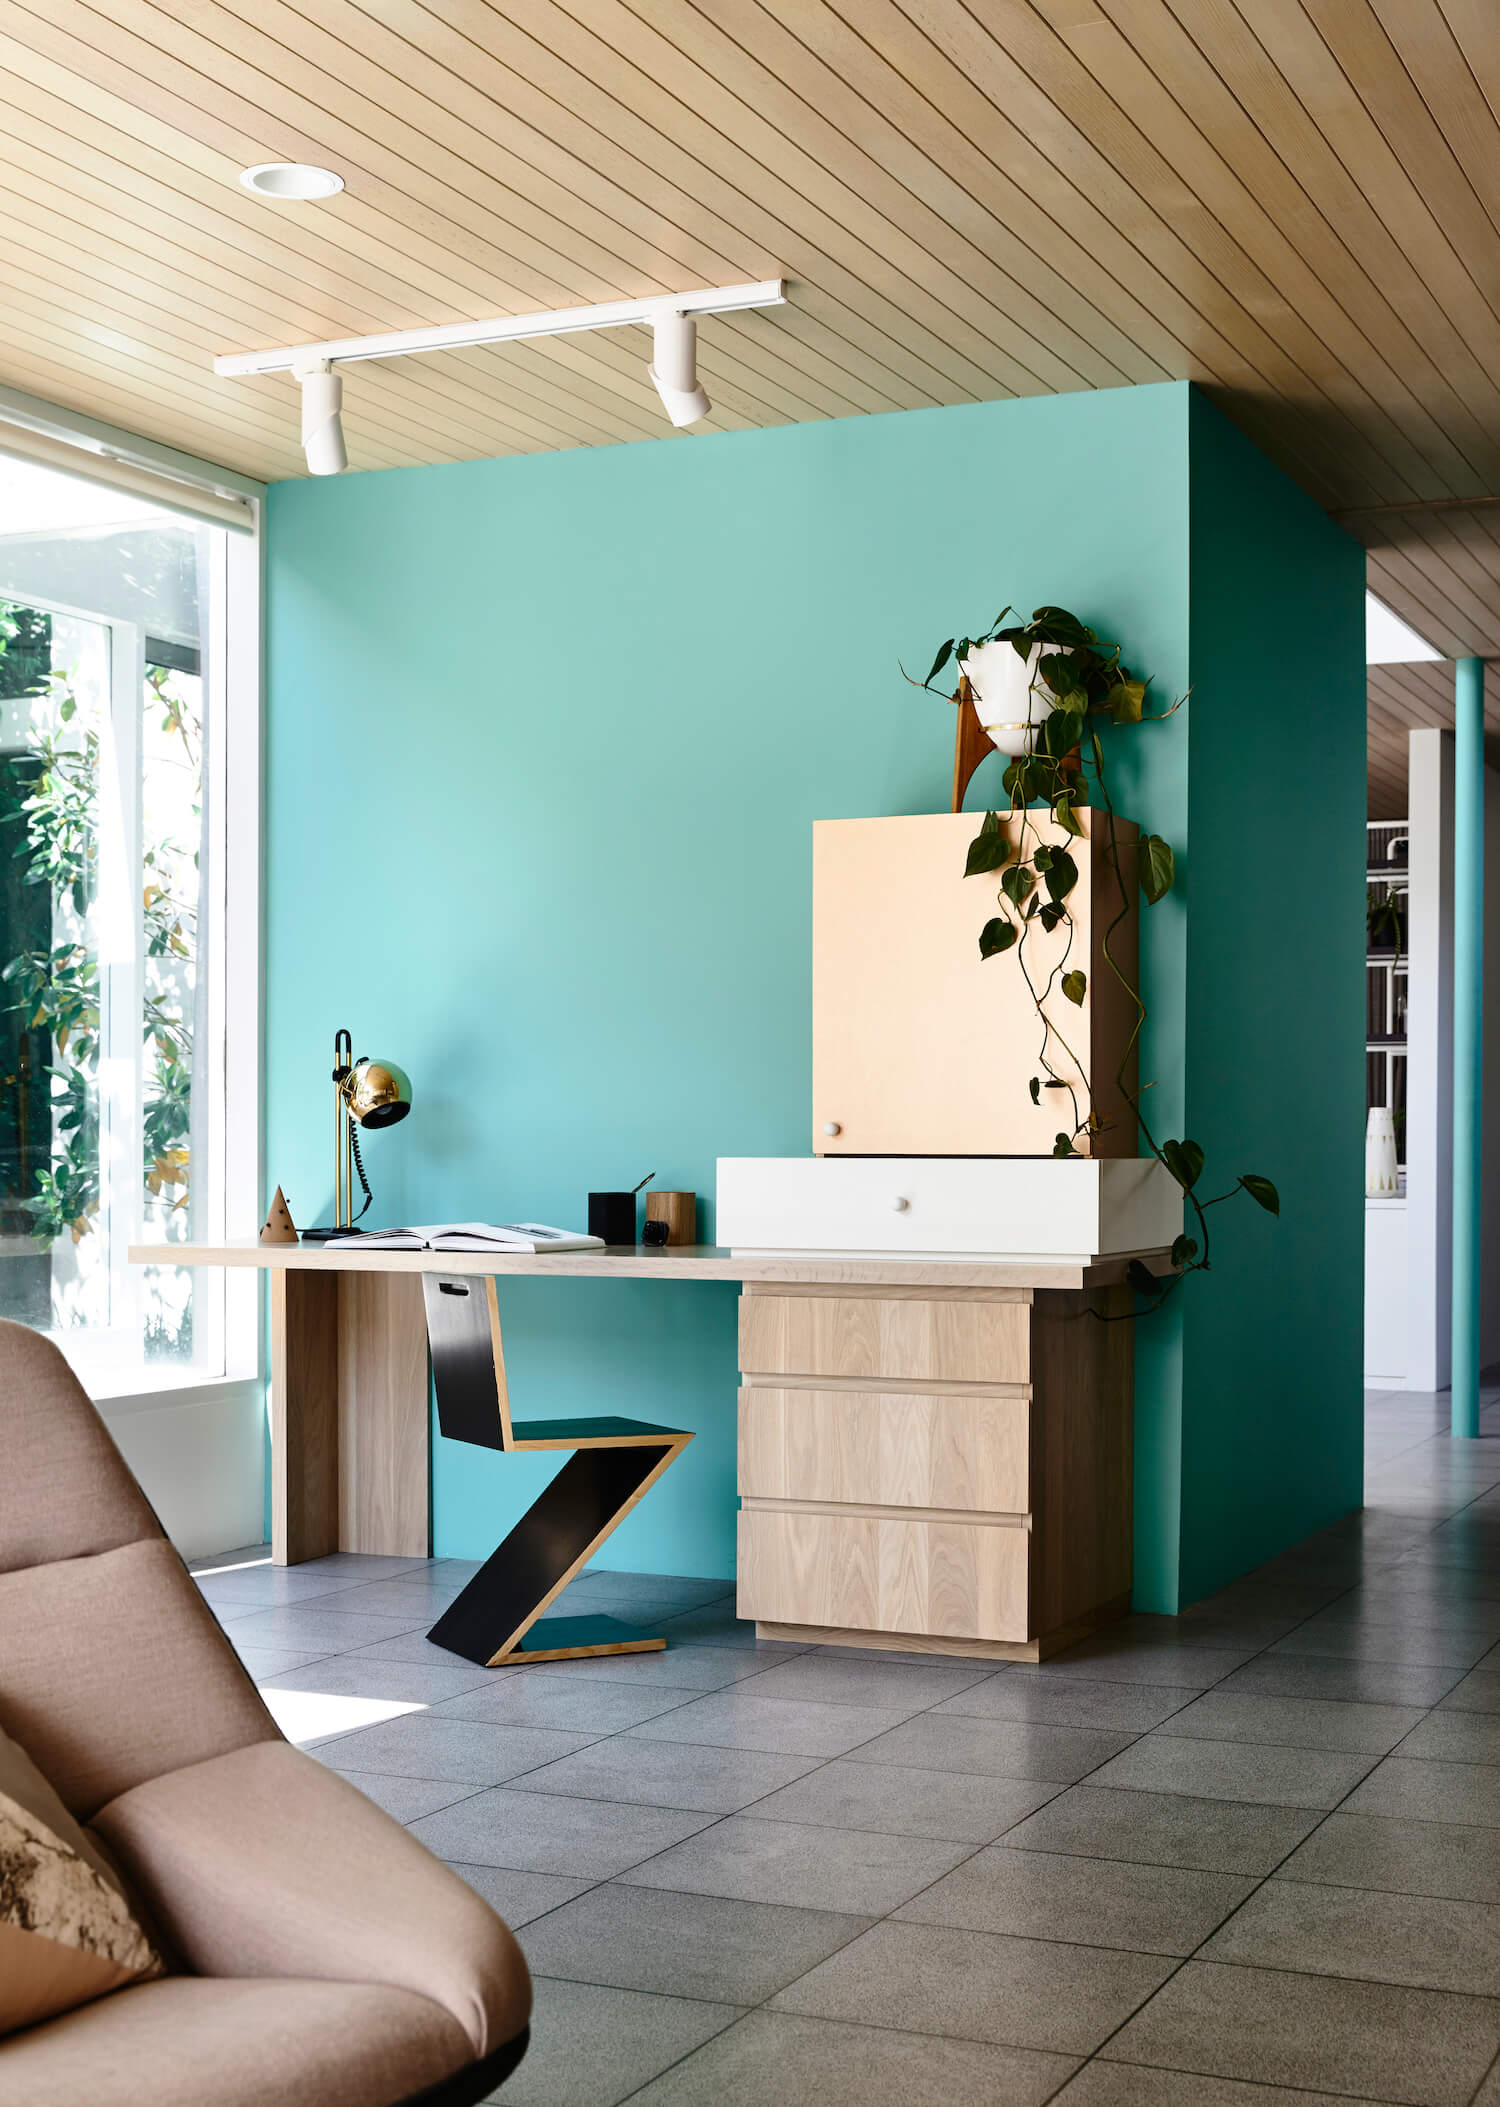 est living designer interview mardi doherty design studio hawthorn res derek swalwell 1